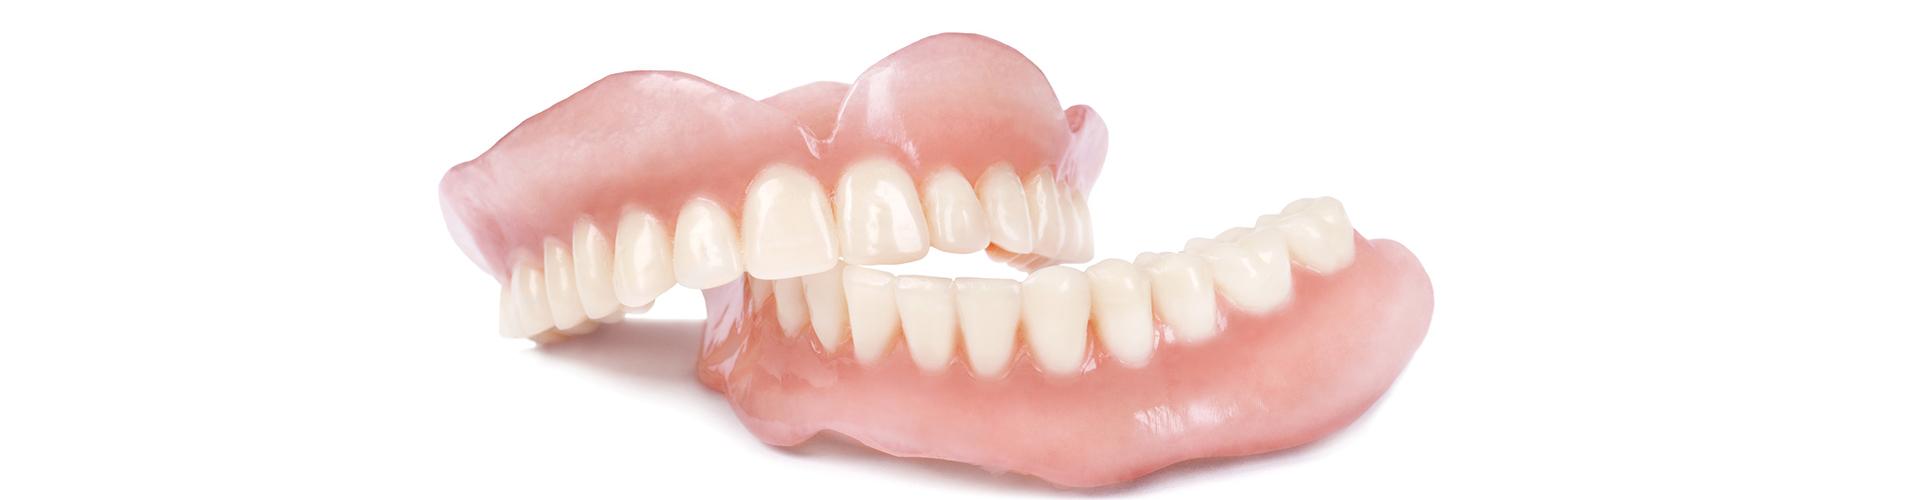 Protesi Dentali Studio Associato Dott. R. Zanetti a Campodarsego Padova